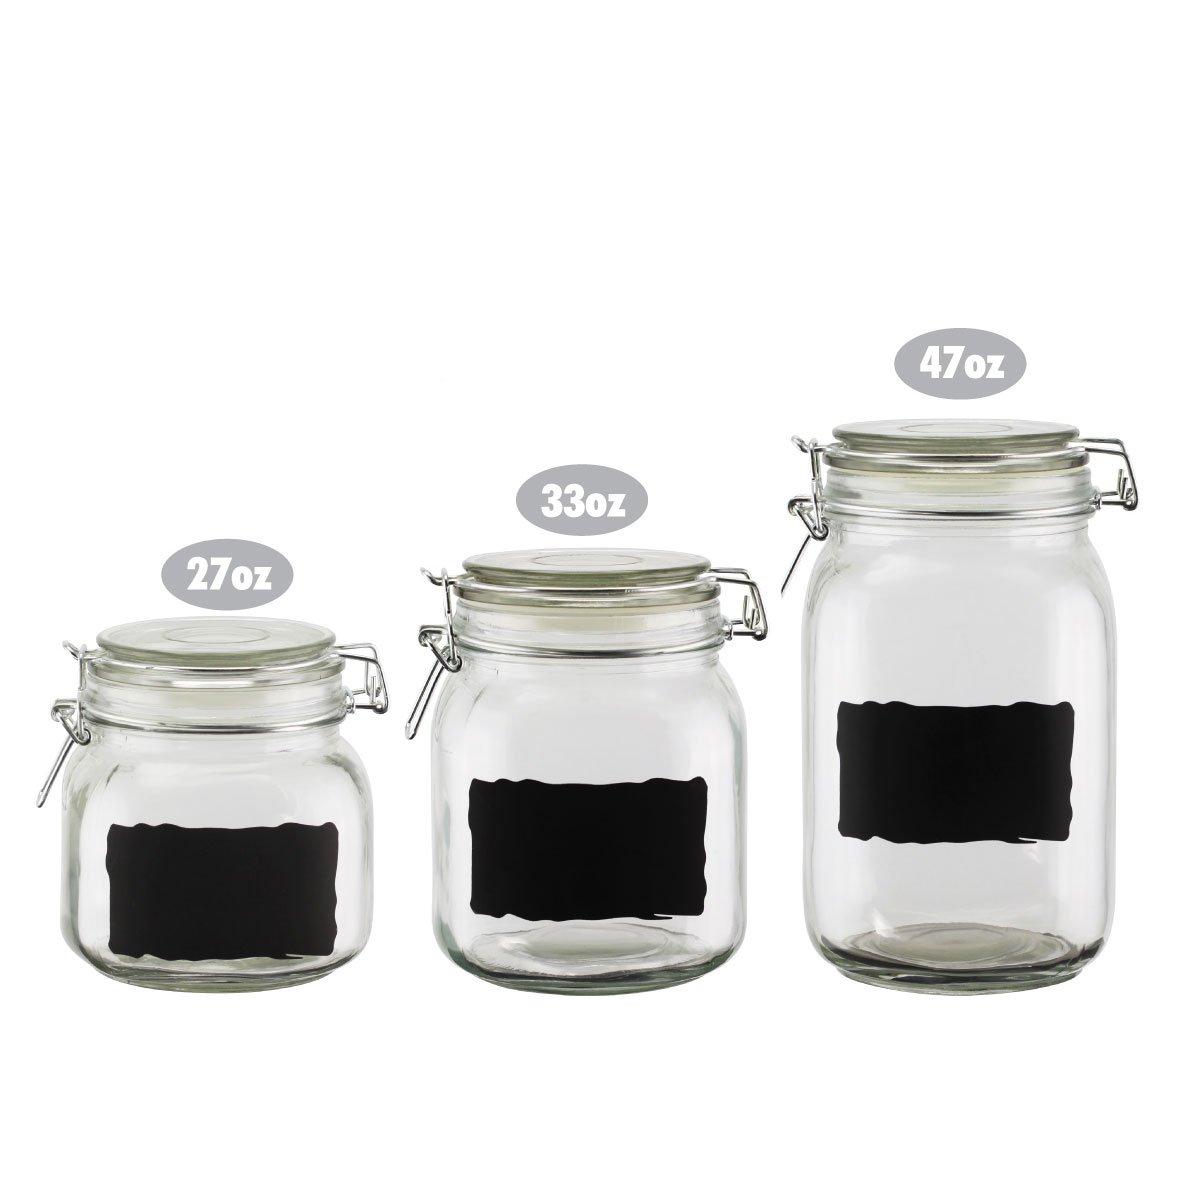 amazon com chalkboard label glass jar canisters quality clear amazon com chalkboard label glass jar canisters quality clear round reusable with air tight lids small 27 oz canister kitchen dining